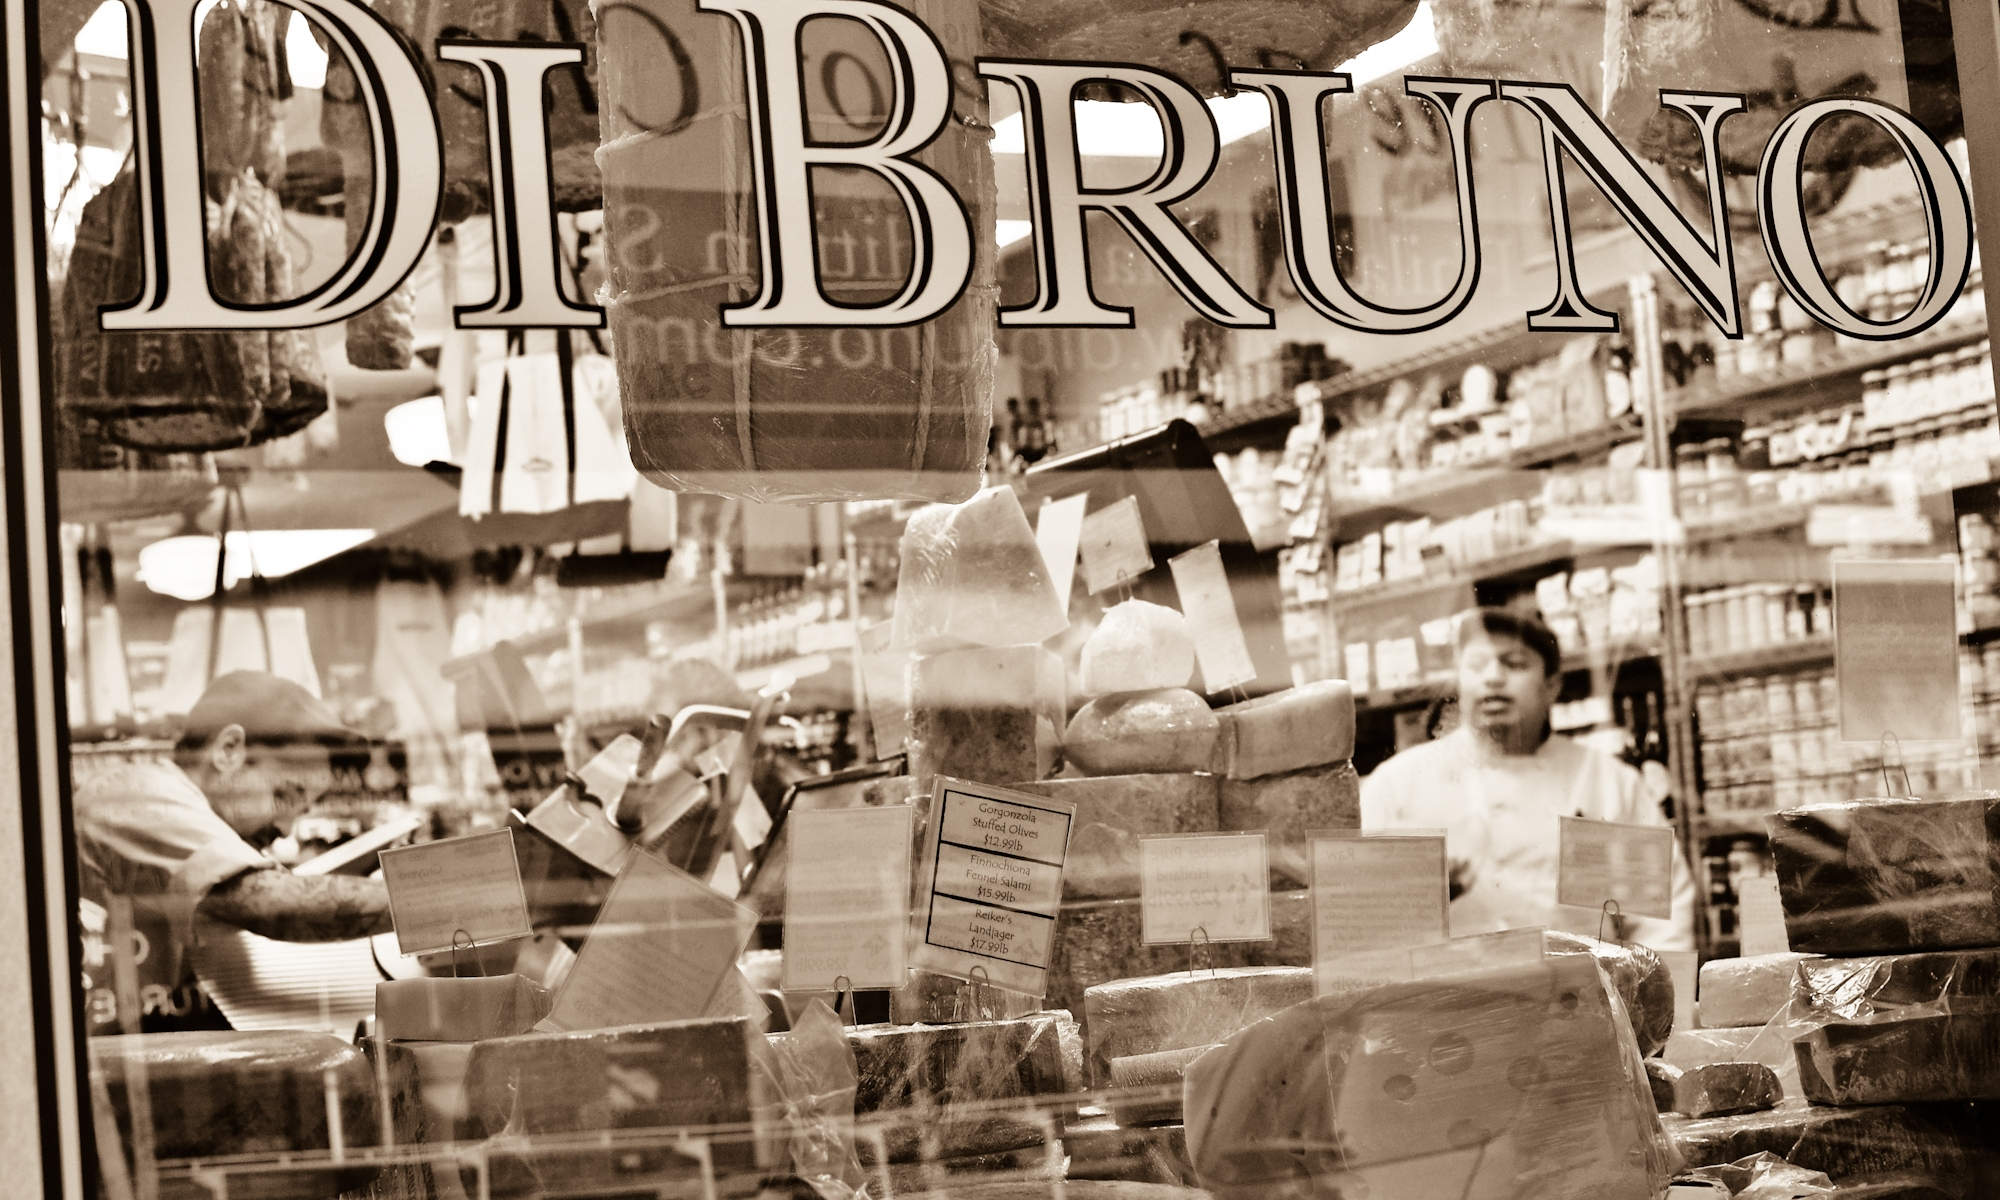 di bruno bros philadelphia, di bruno store, philadelphia, 9th street market, italian market, food,